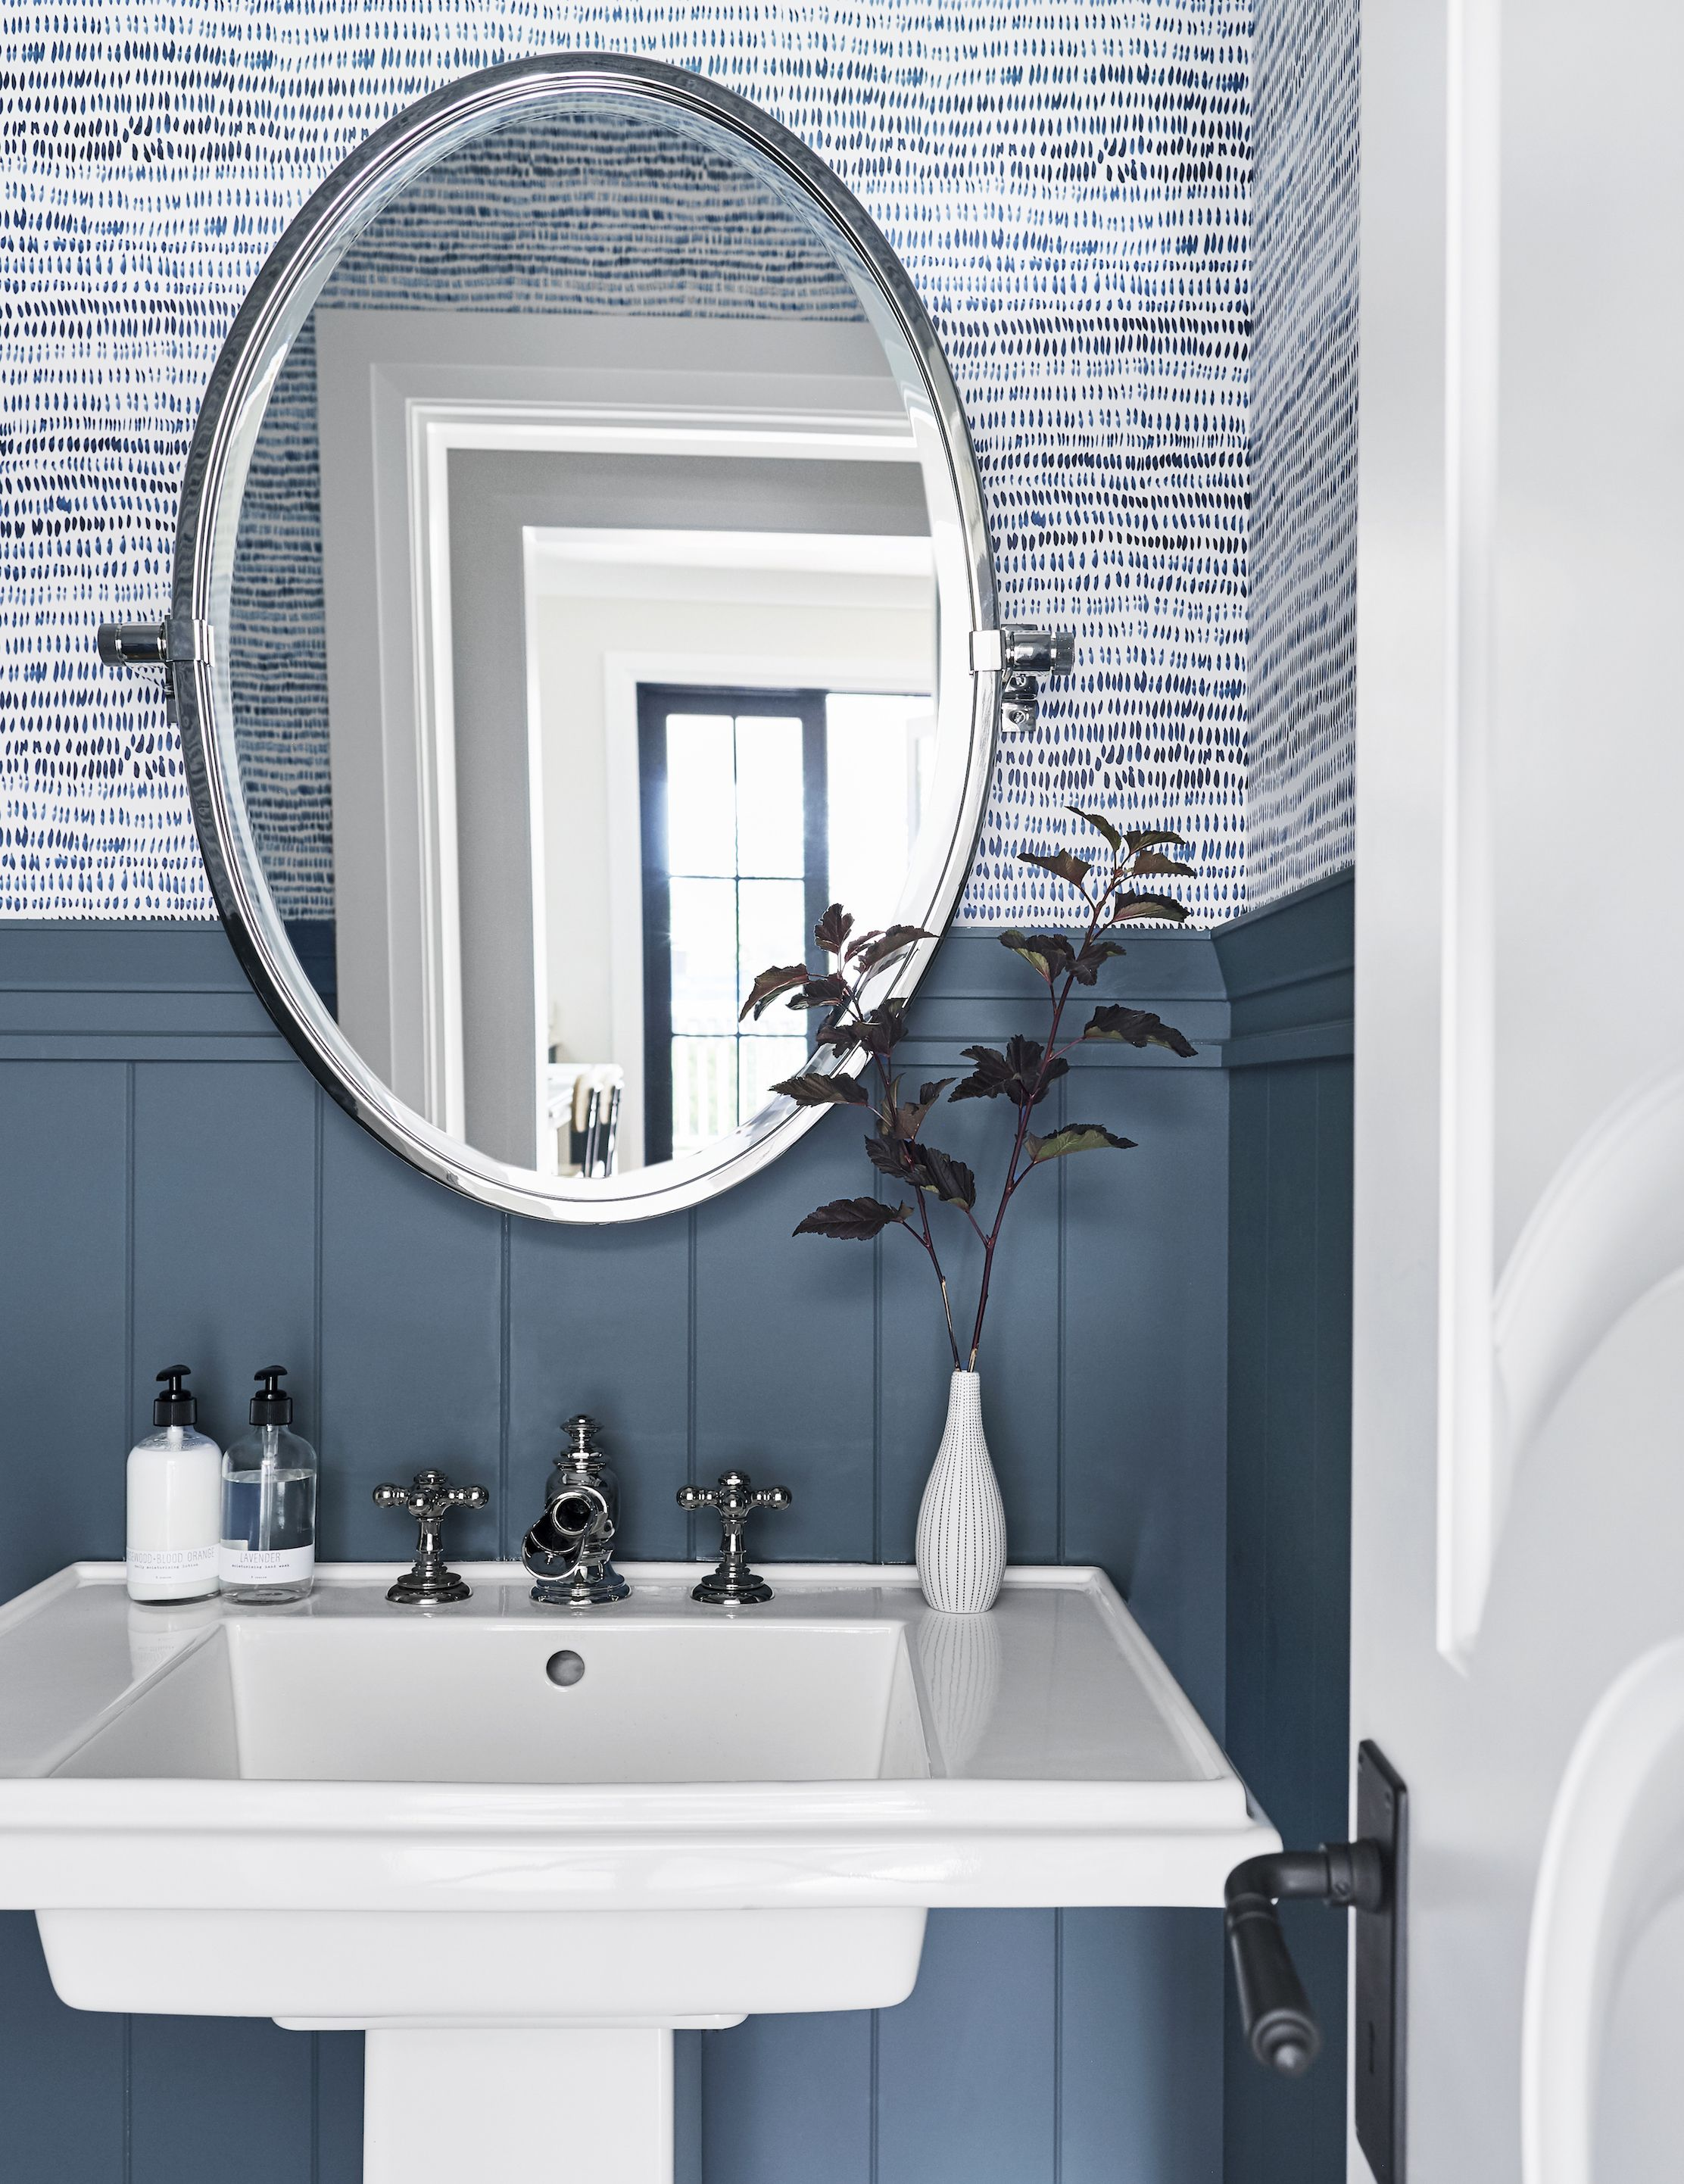 Free download 25 Bathroom Wallpaper Ideas Best Wallpaper ...